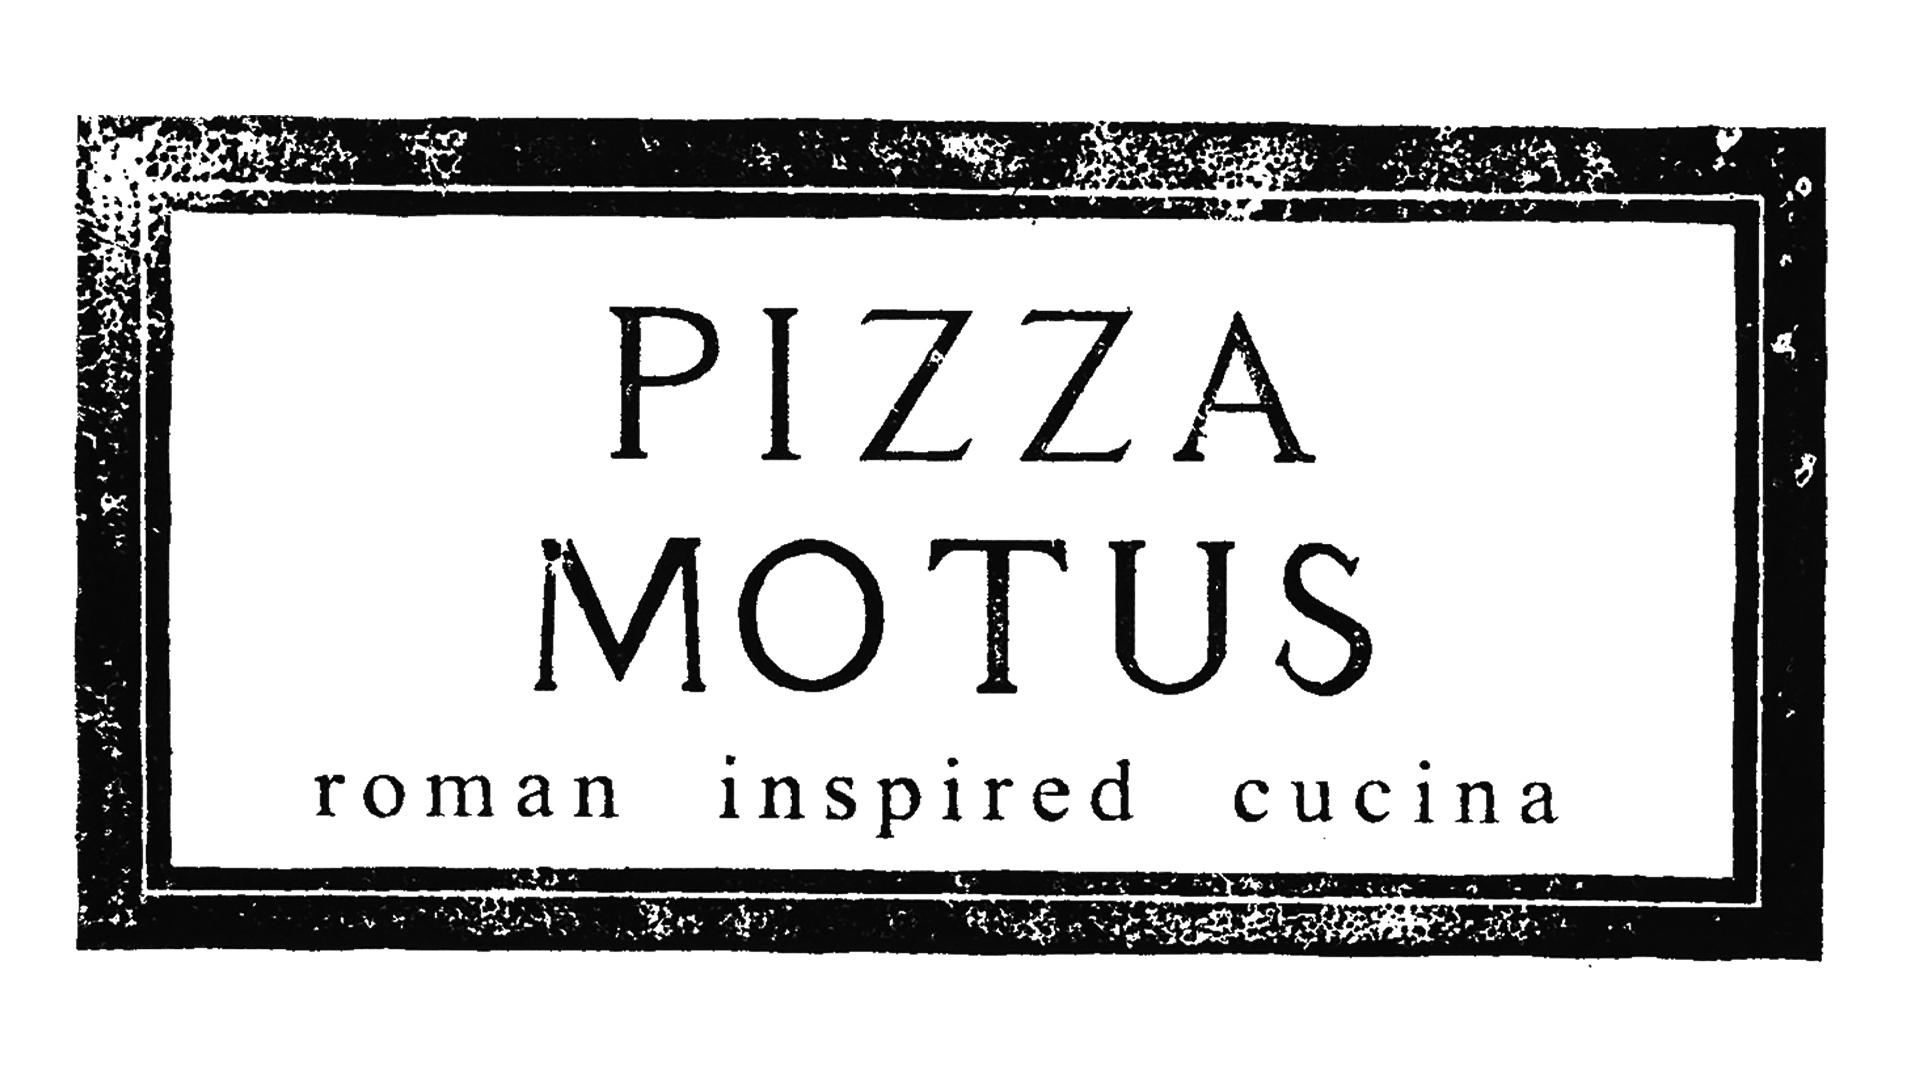 PizzaMotusBlackLogo_1920x1080